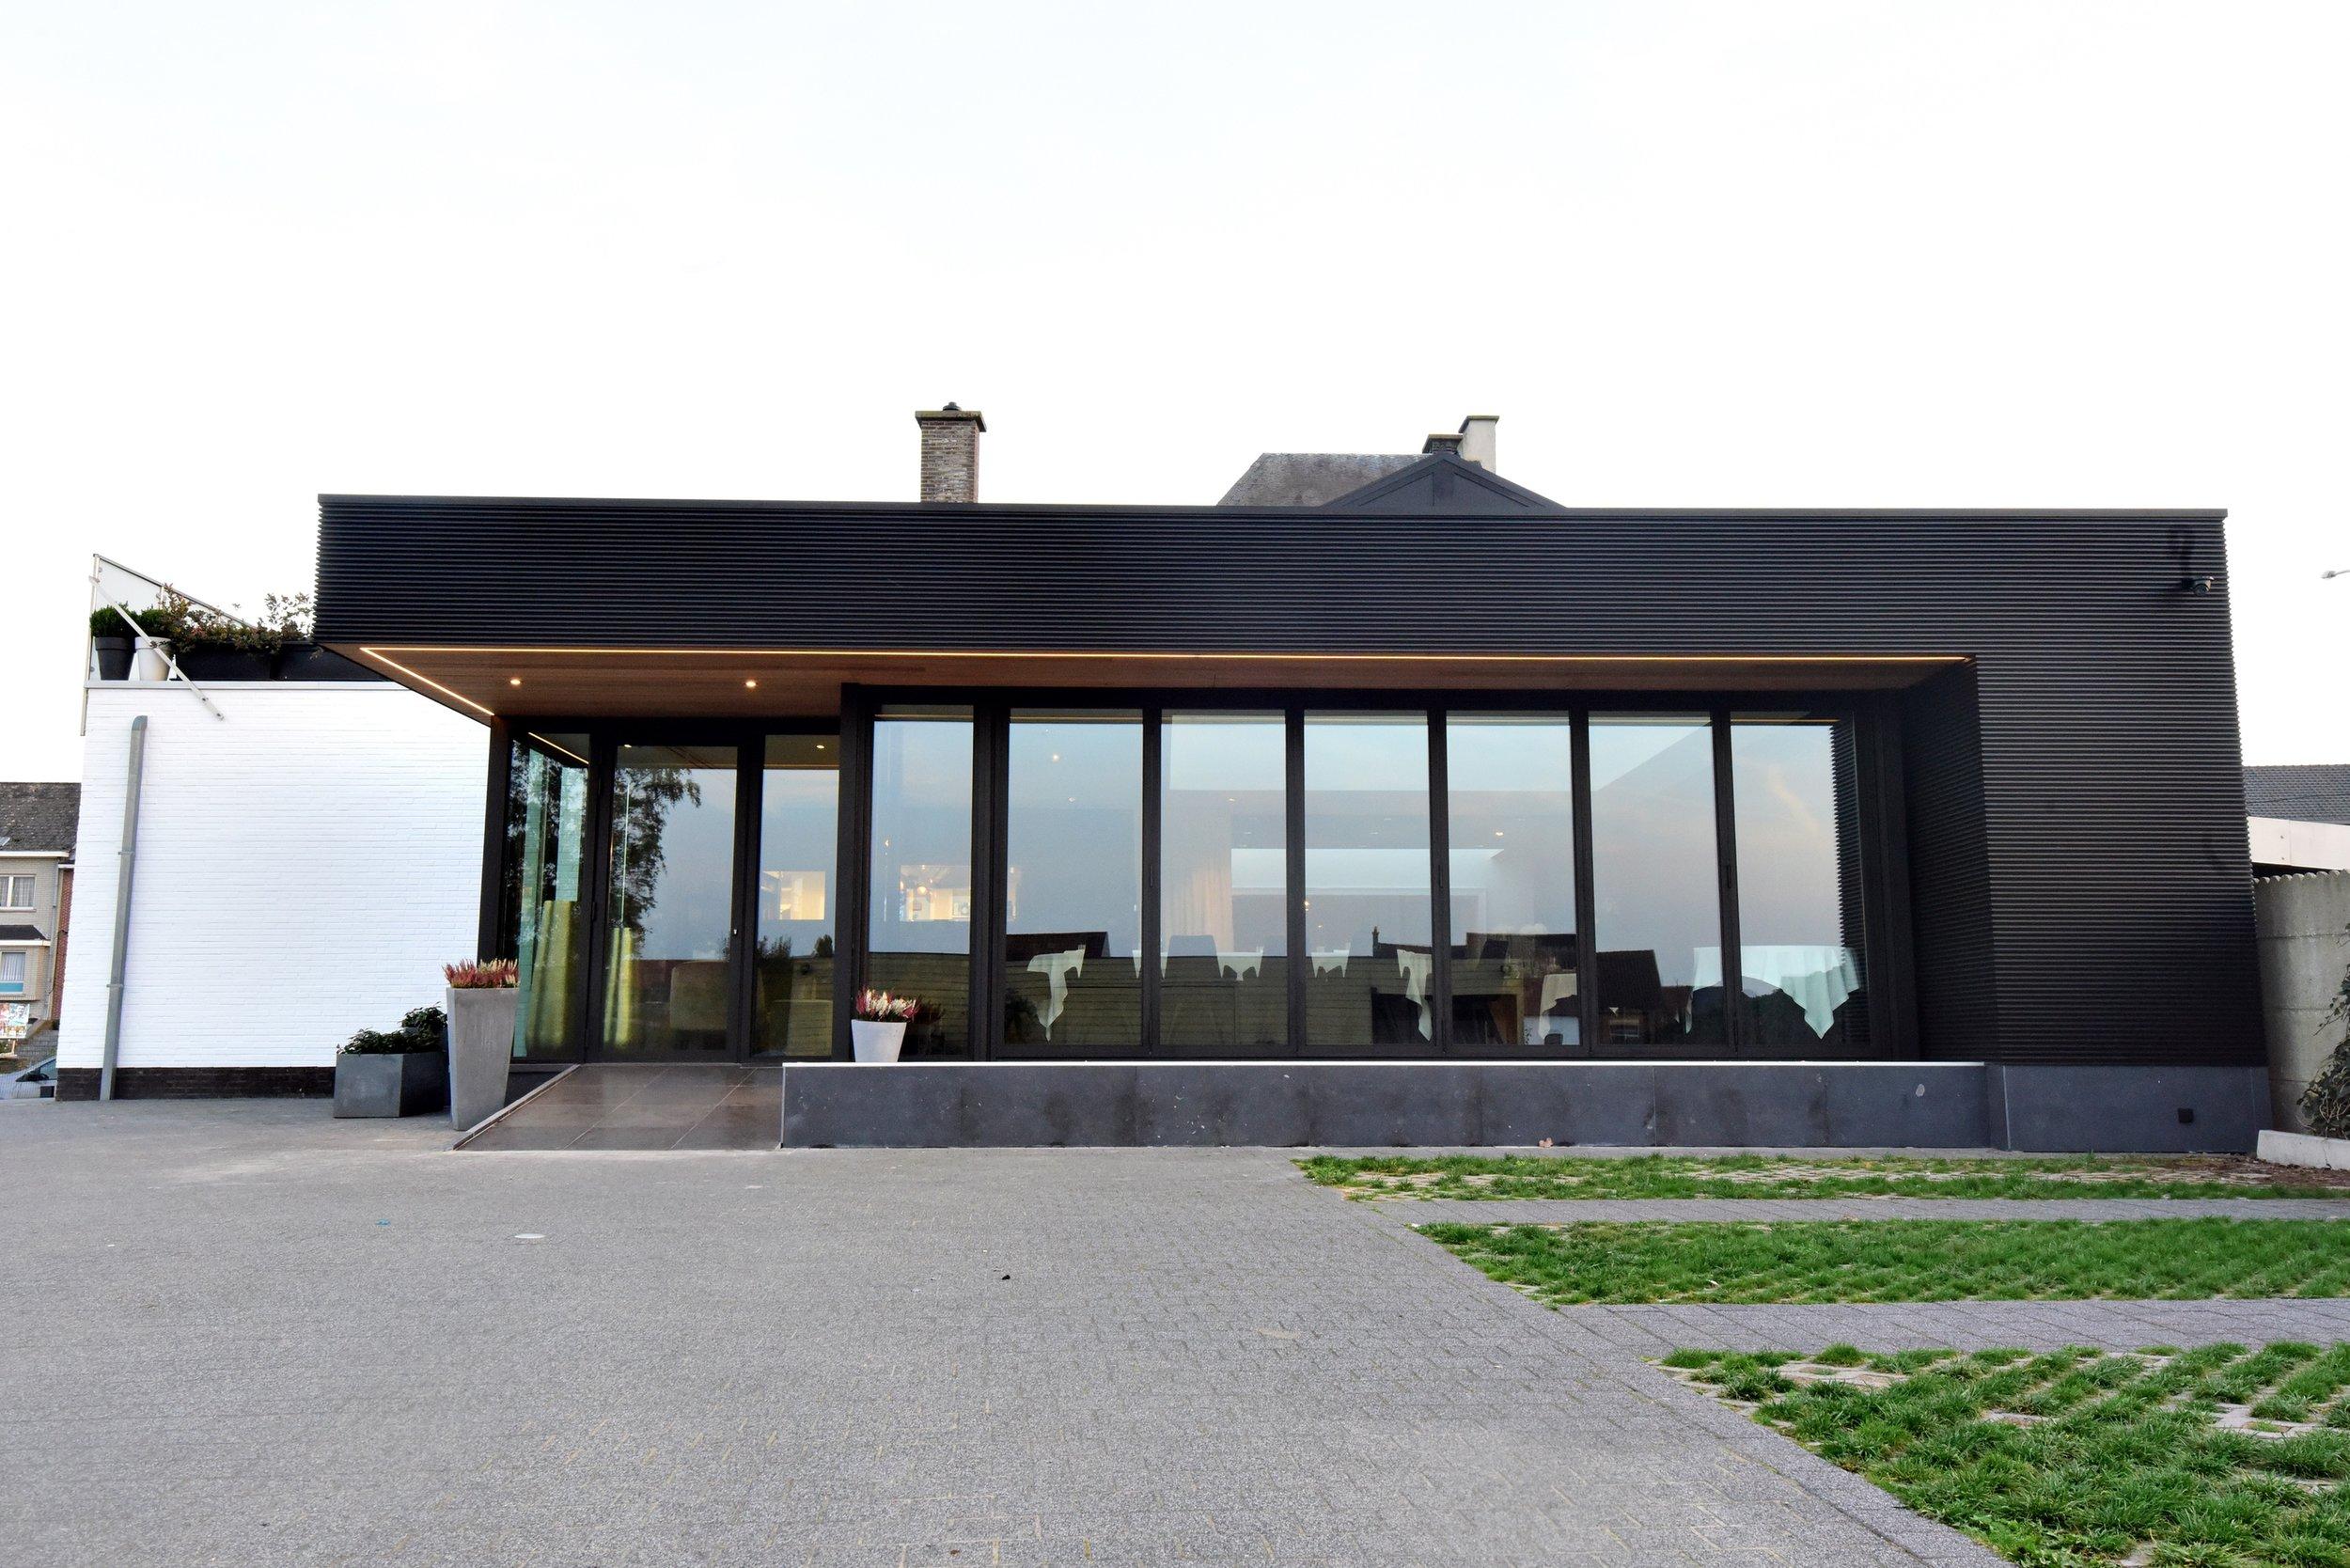 34 restaurant de bakermat ninove tablefever bart albrecht culinair fotograaf.jpg